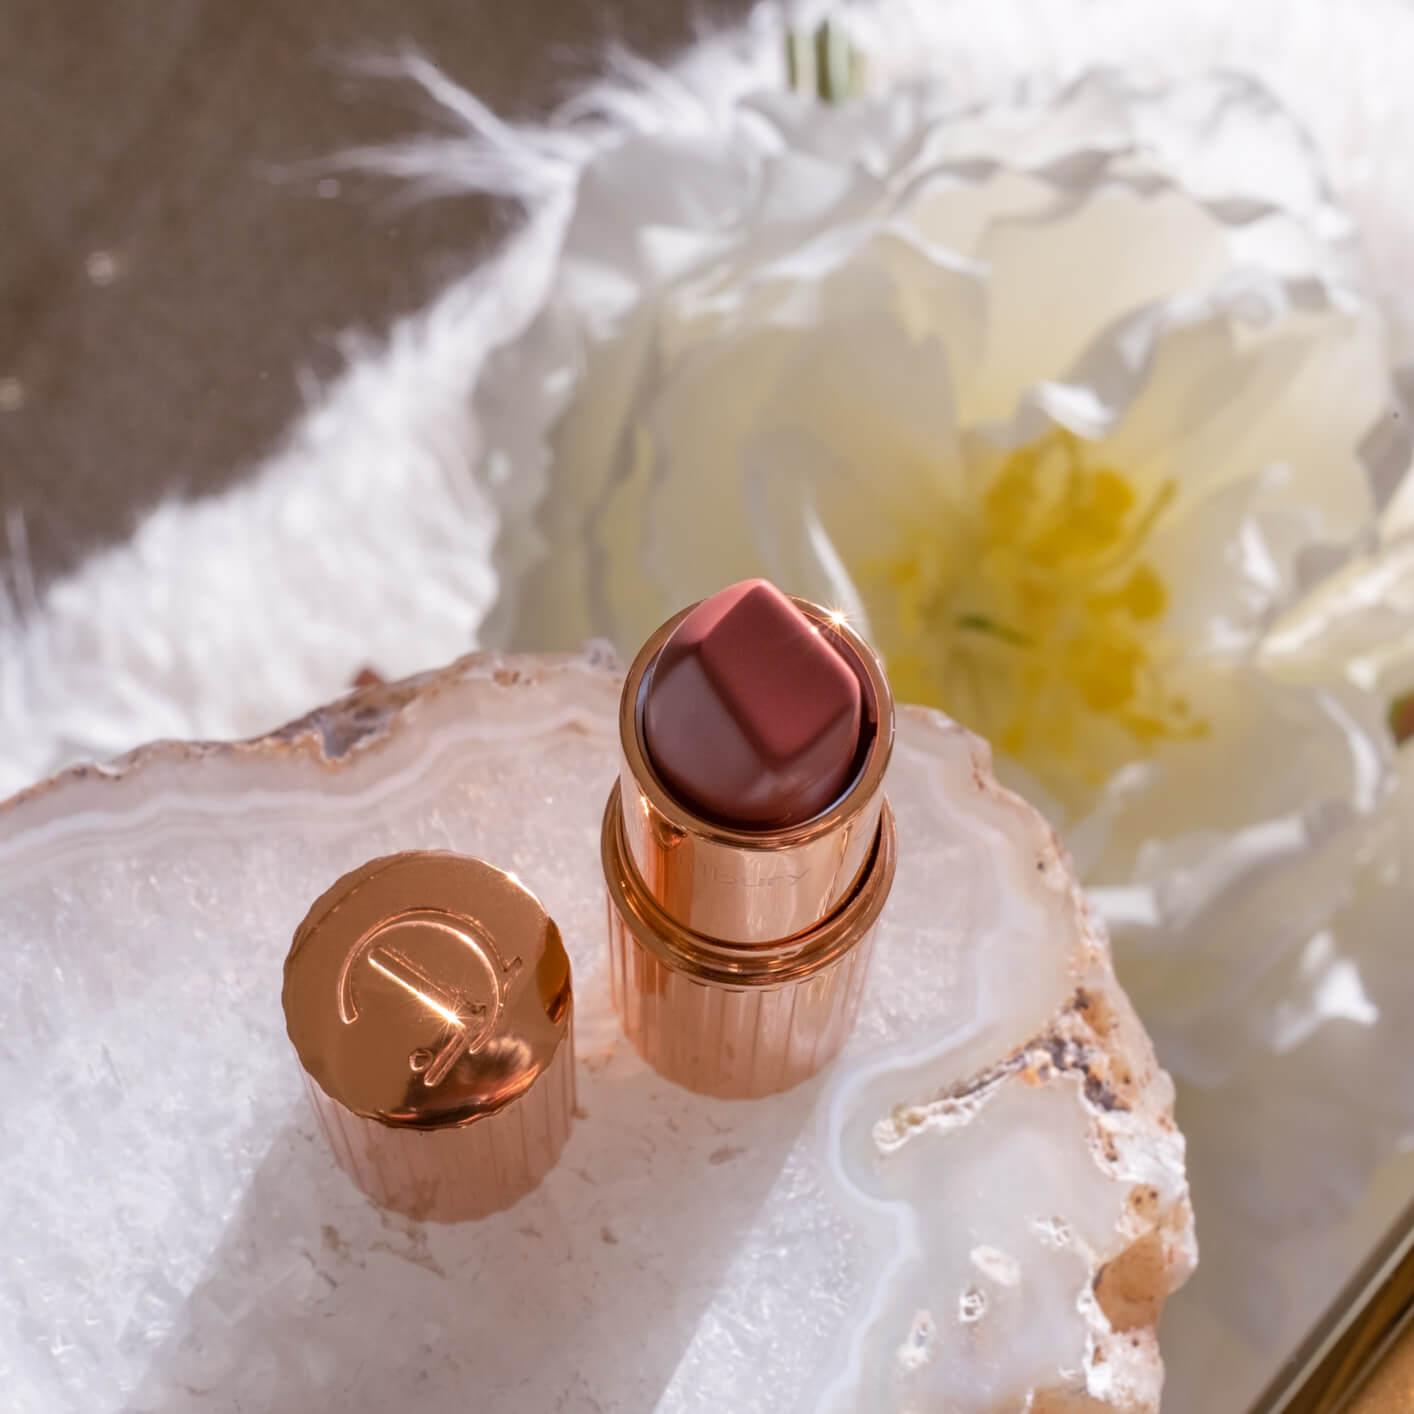 Charlotte Tilbury Pillow Talk lipstick bullet